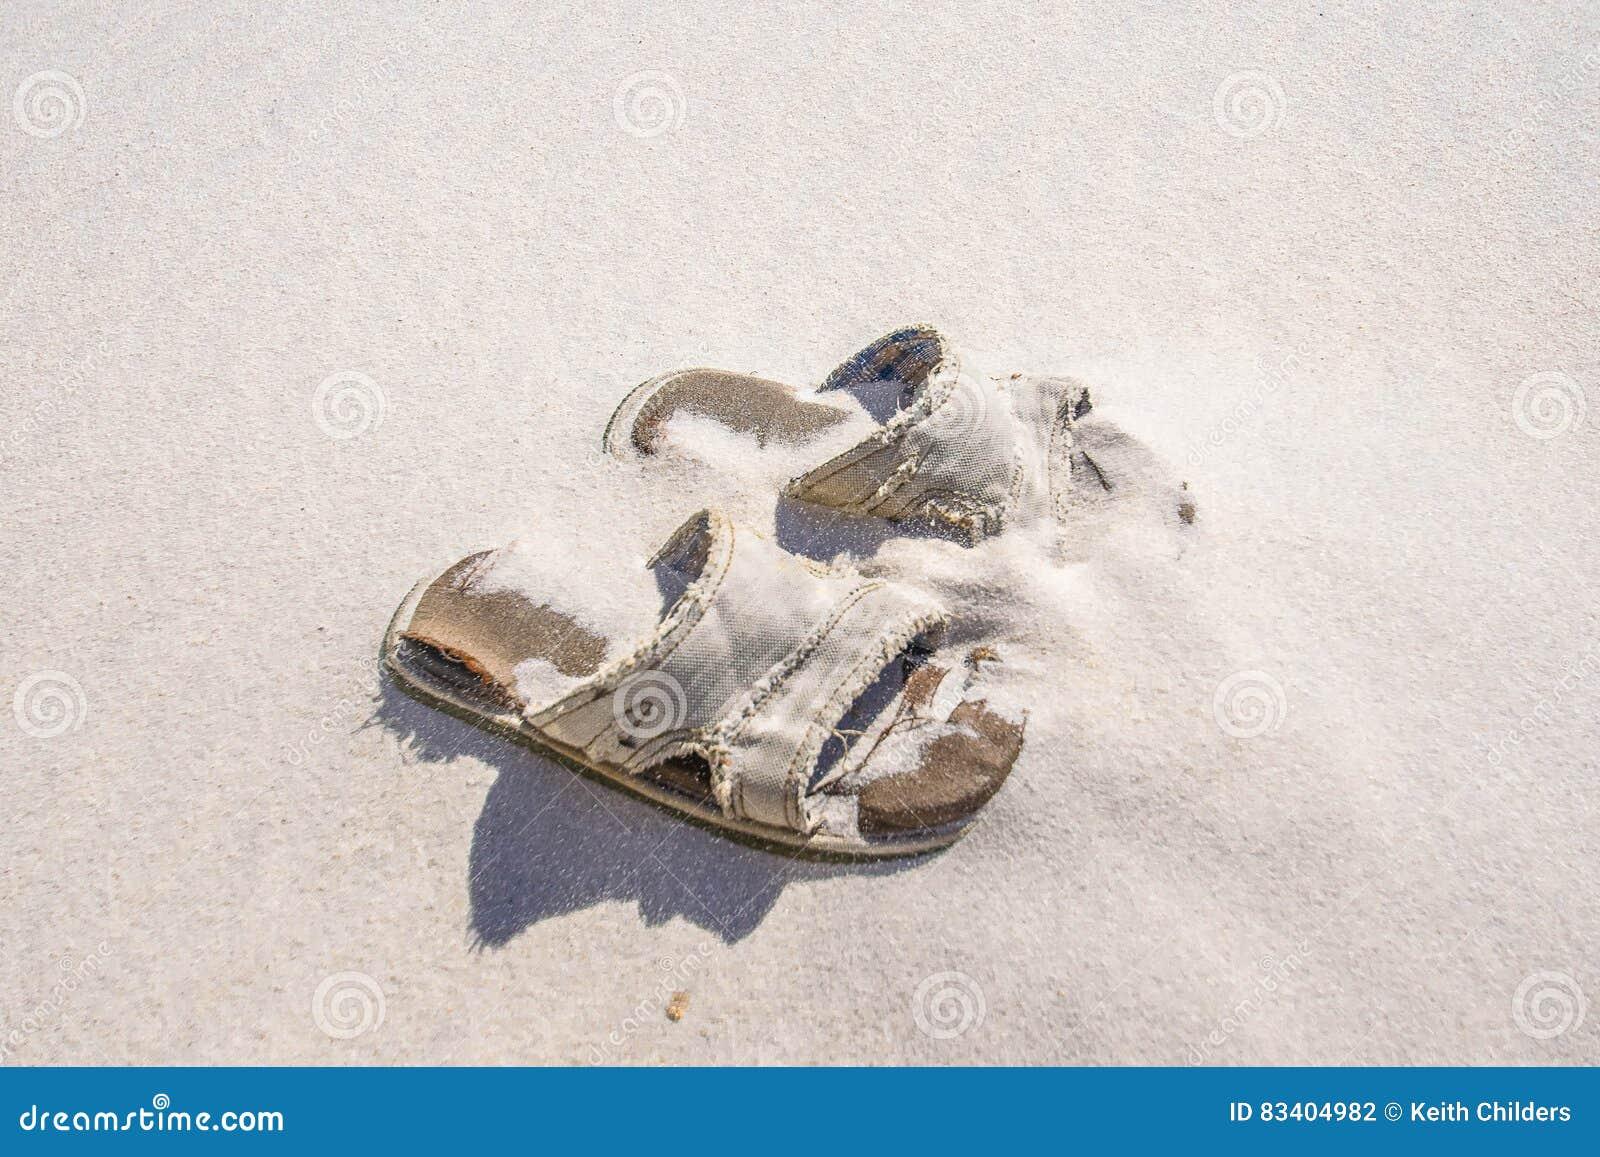 997935d65e08 A pair of men`s beach sandals left on the Florida coast.